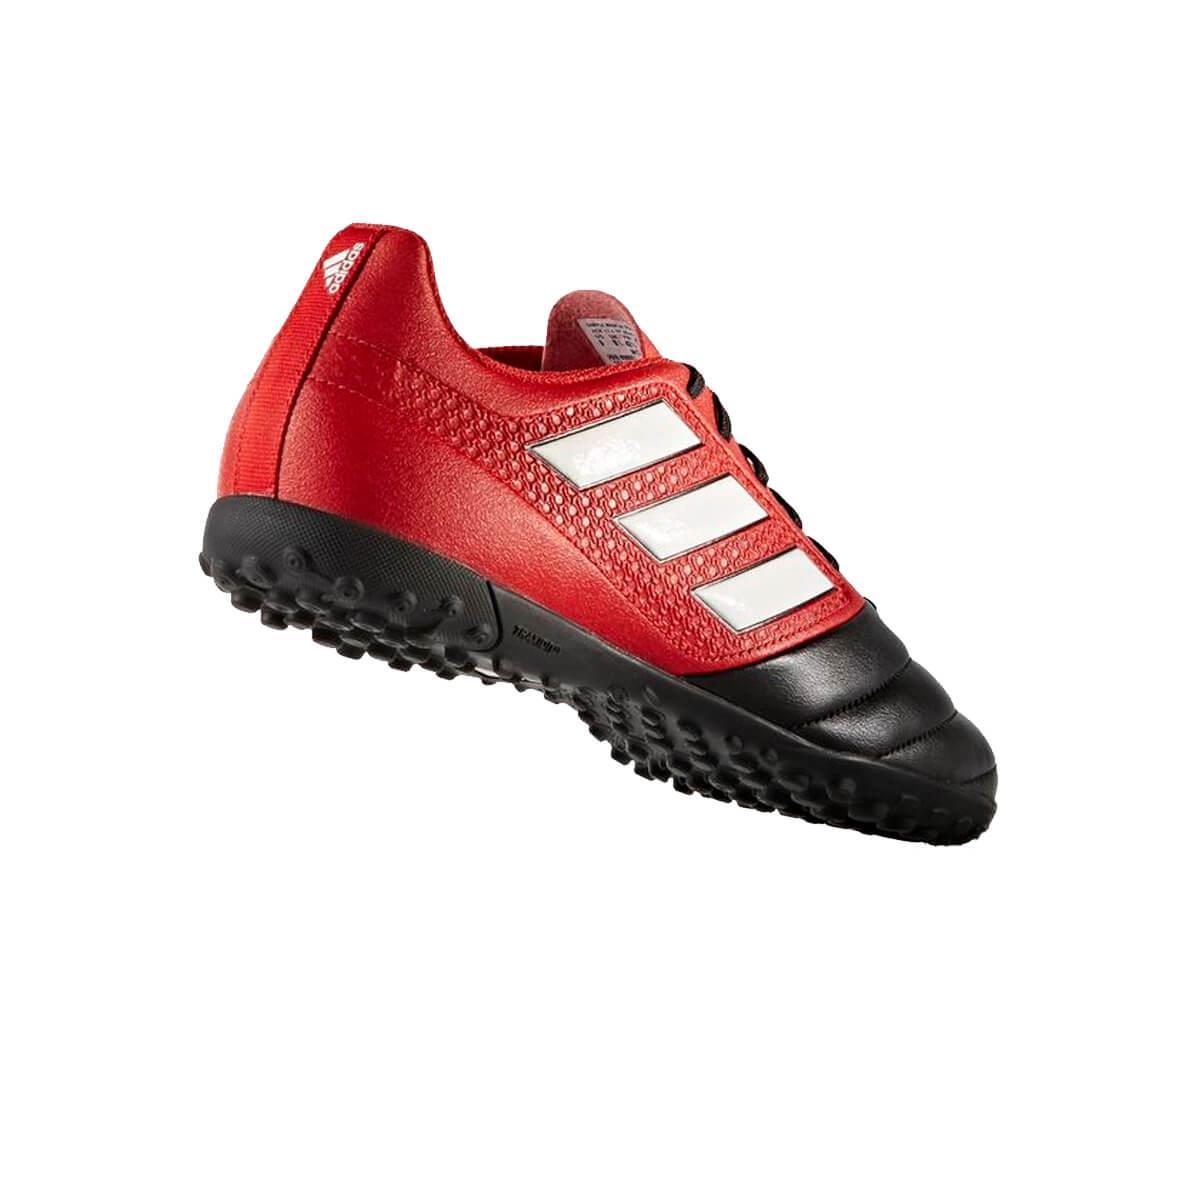 af958a29a9 Chuteira Society Adidas Ace 17 4 TF